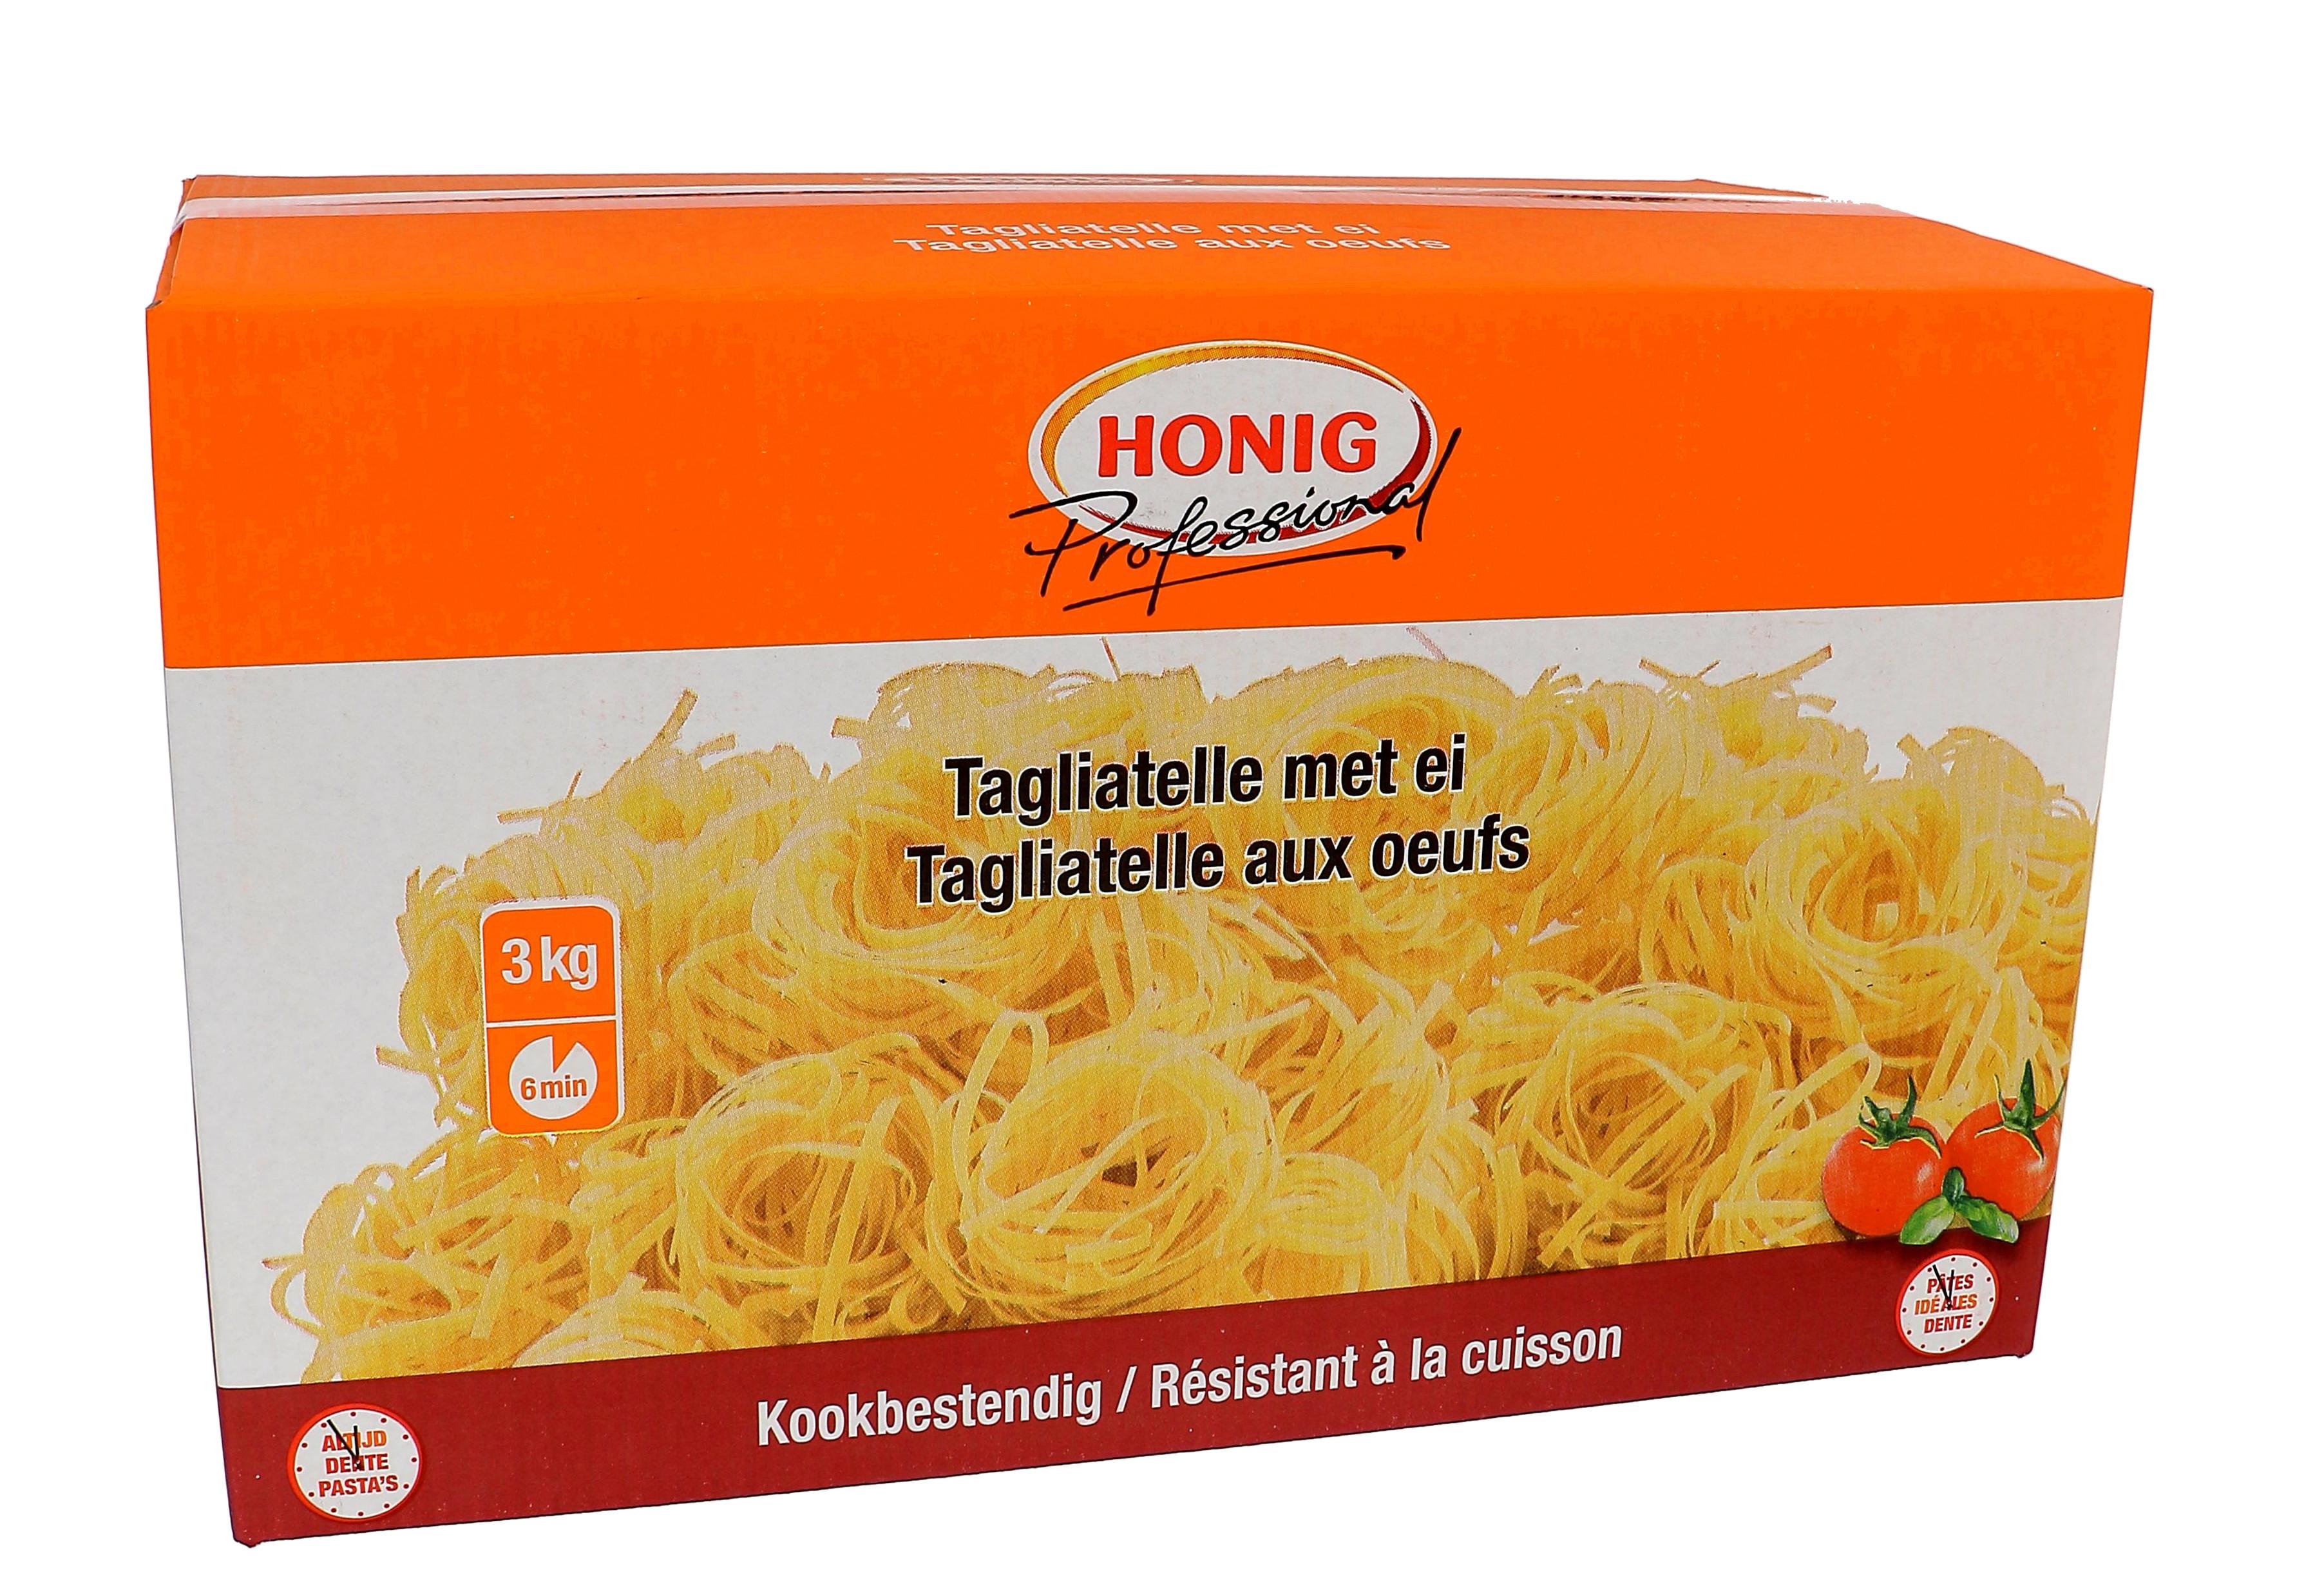 Honig pates tagliatelle naturel aux oeufs 3kg Professional